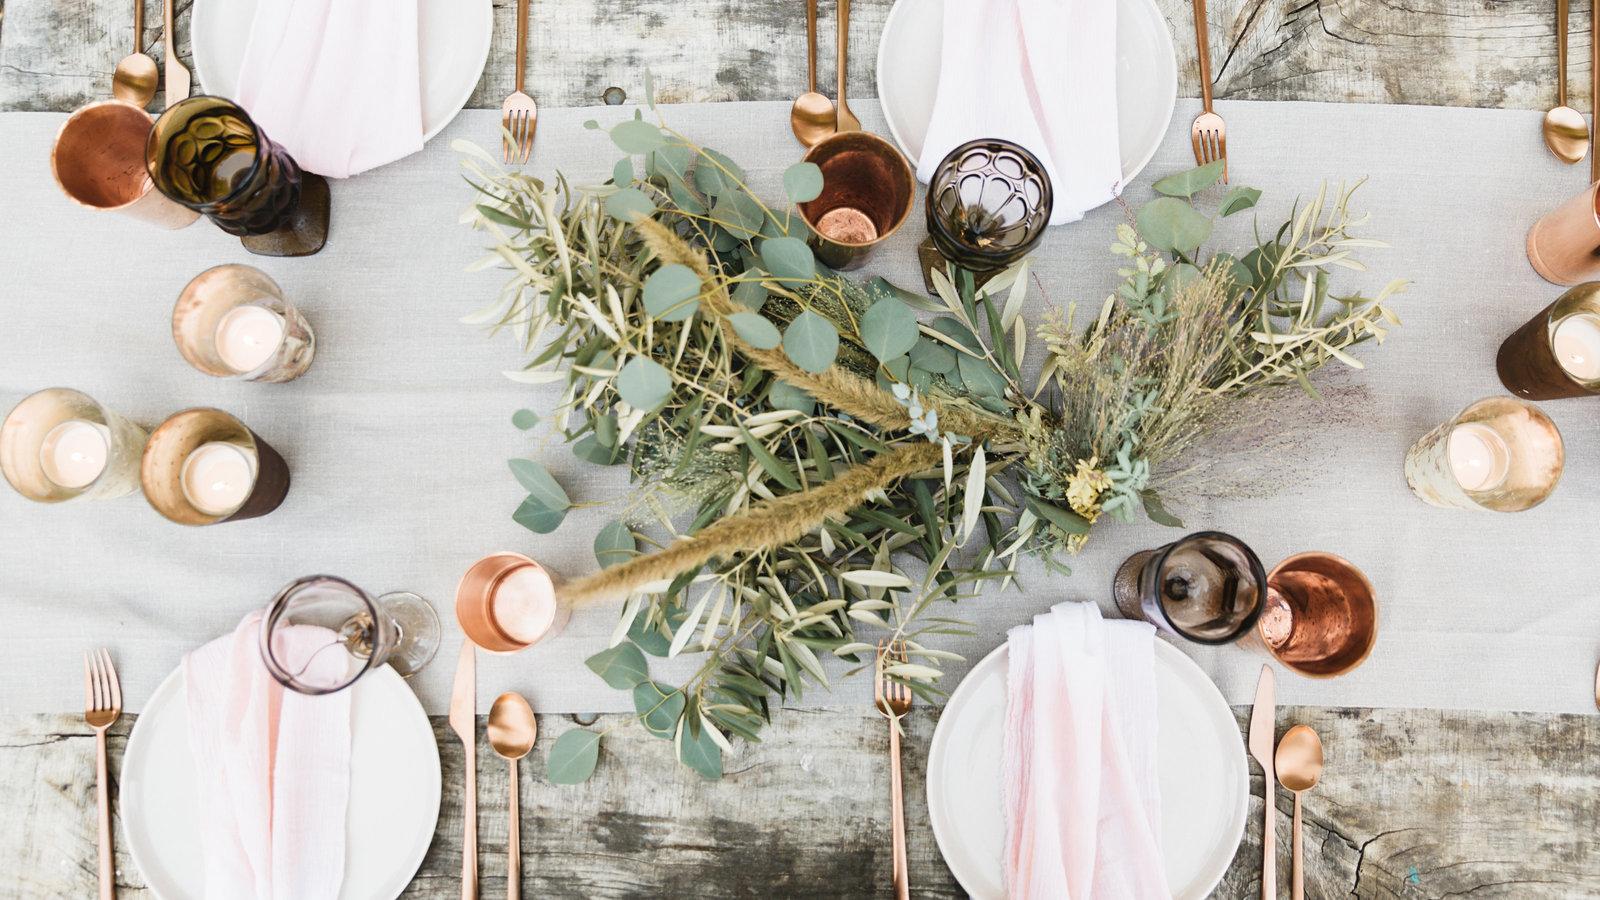 jana williams photography-Thanksgiving DIY Decore ideas (16 of 16)